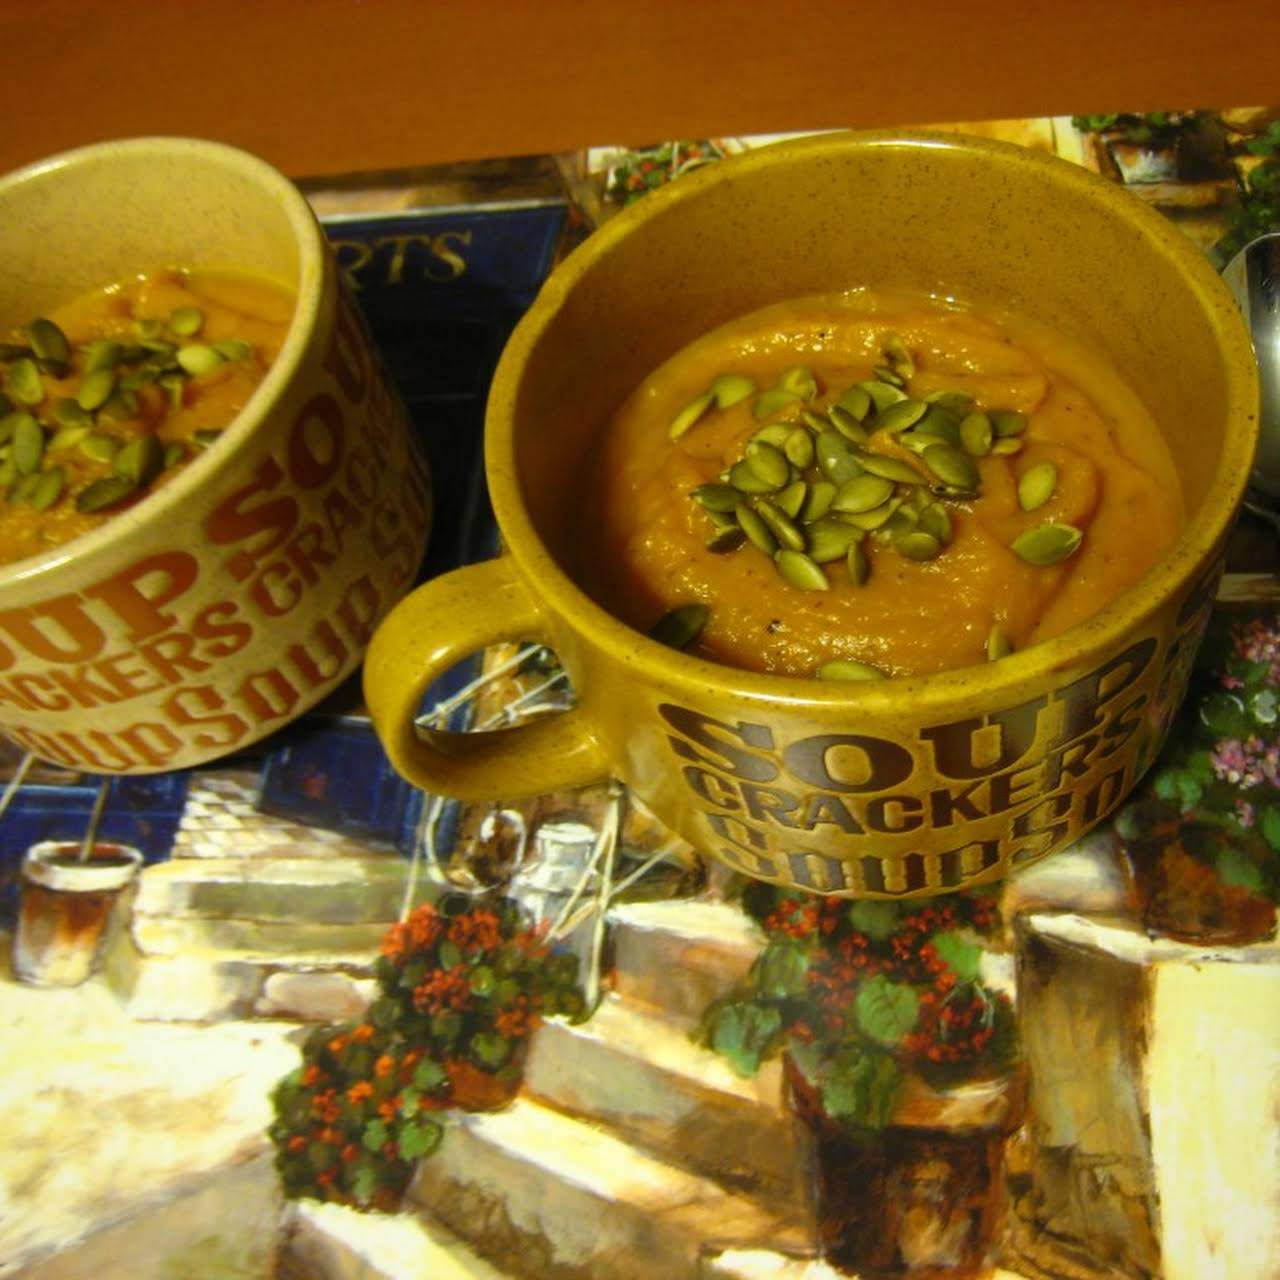 Roasted Butternut Squash, Carrot & Yam Soup (Dairy-free, gluten-free, vegan)